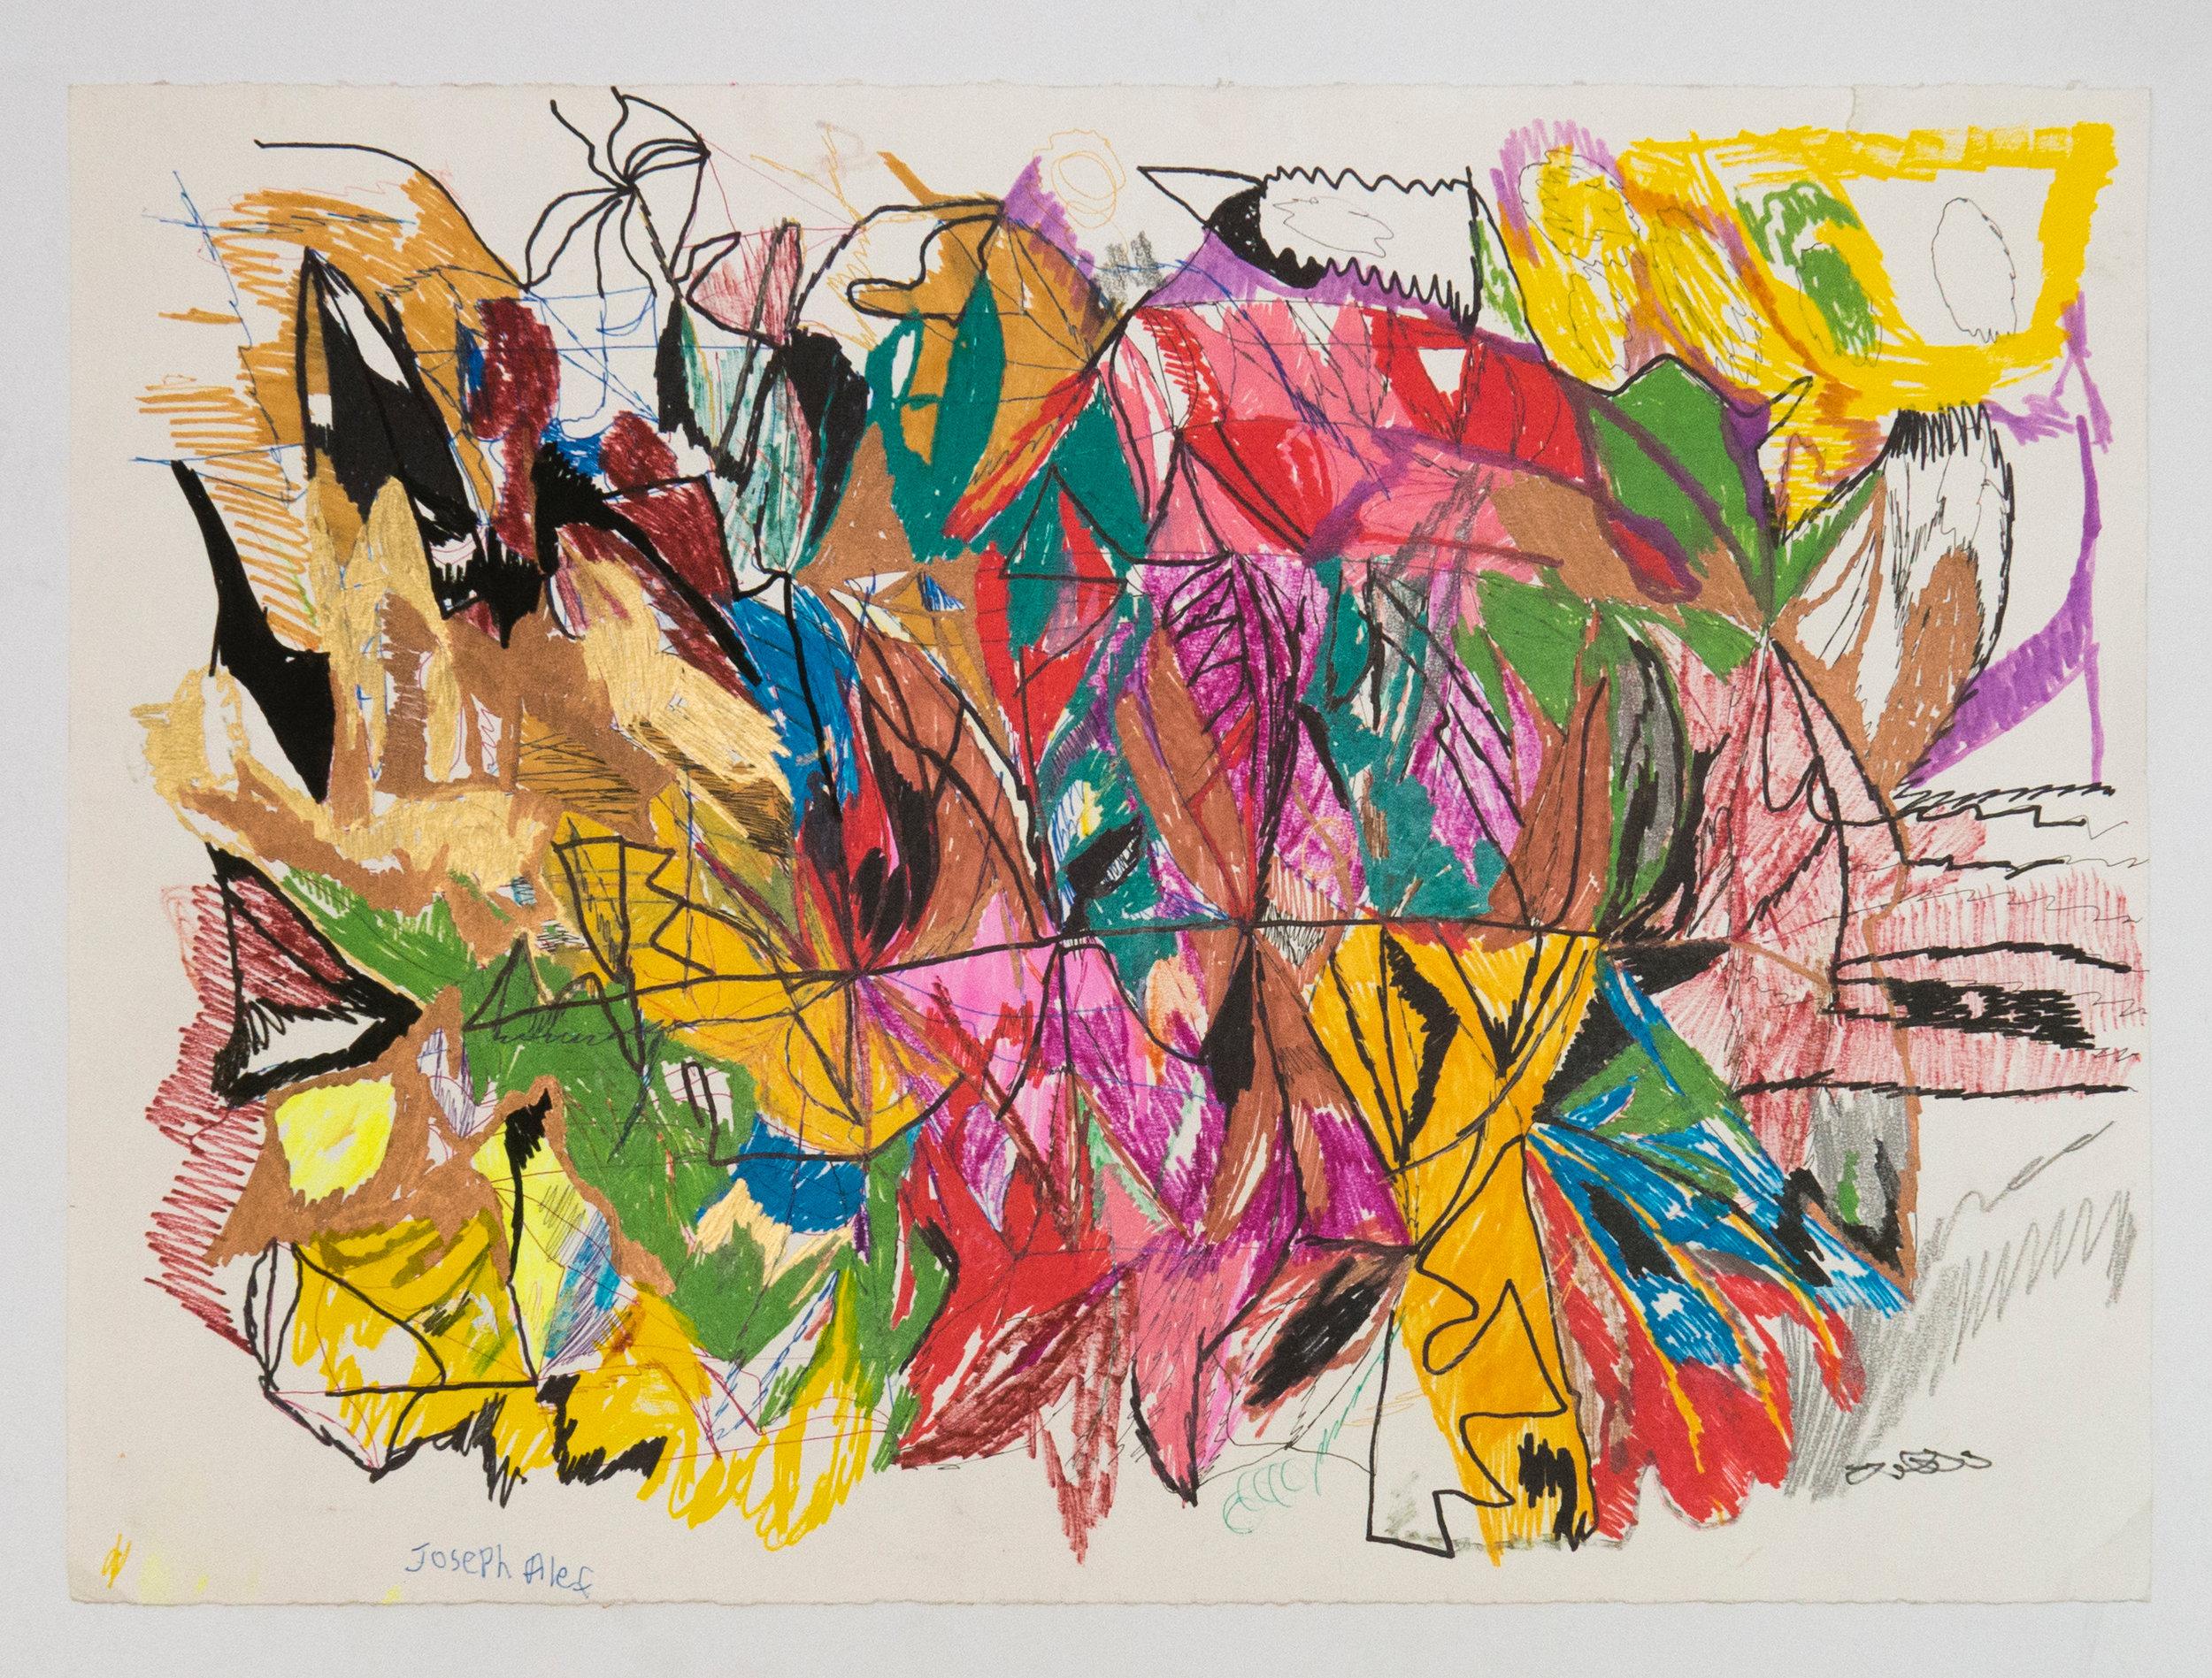 Joseph Alef, Untitled (JA 091), 2015, Work on paper, 22 x 30 inches